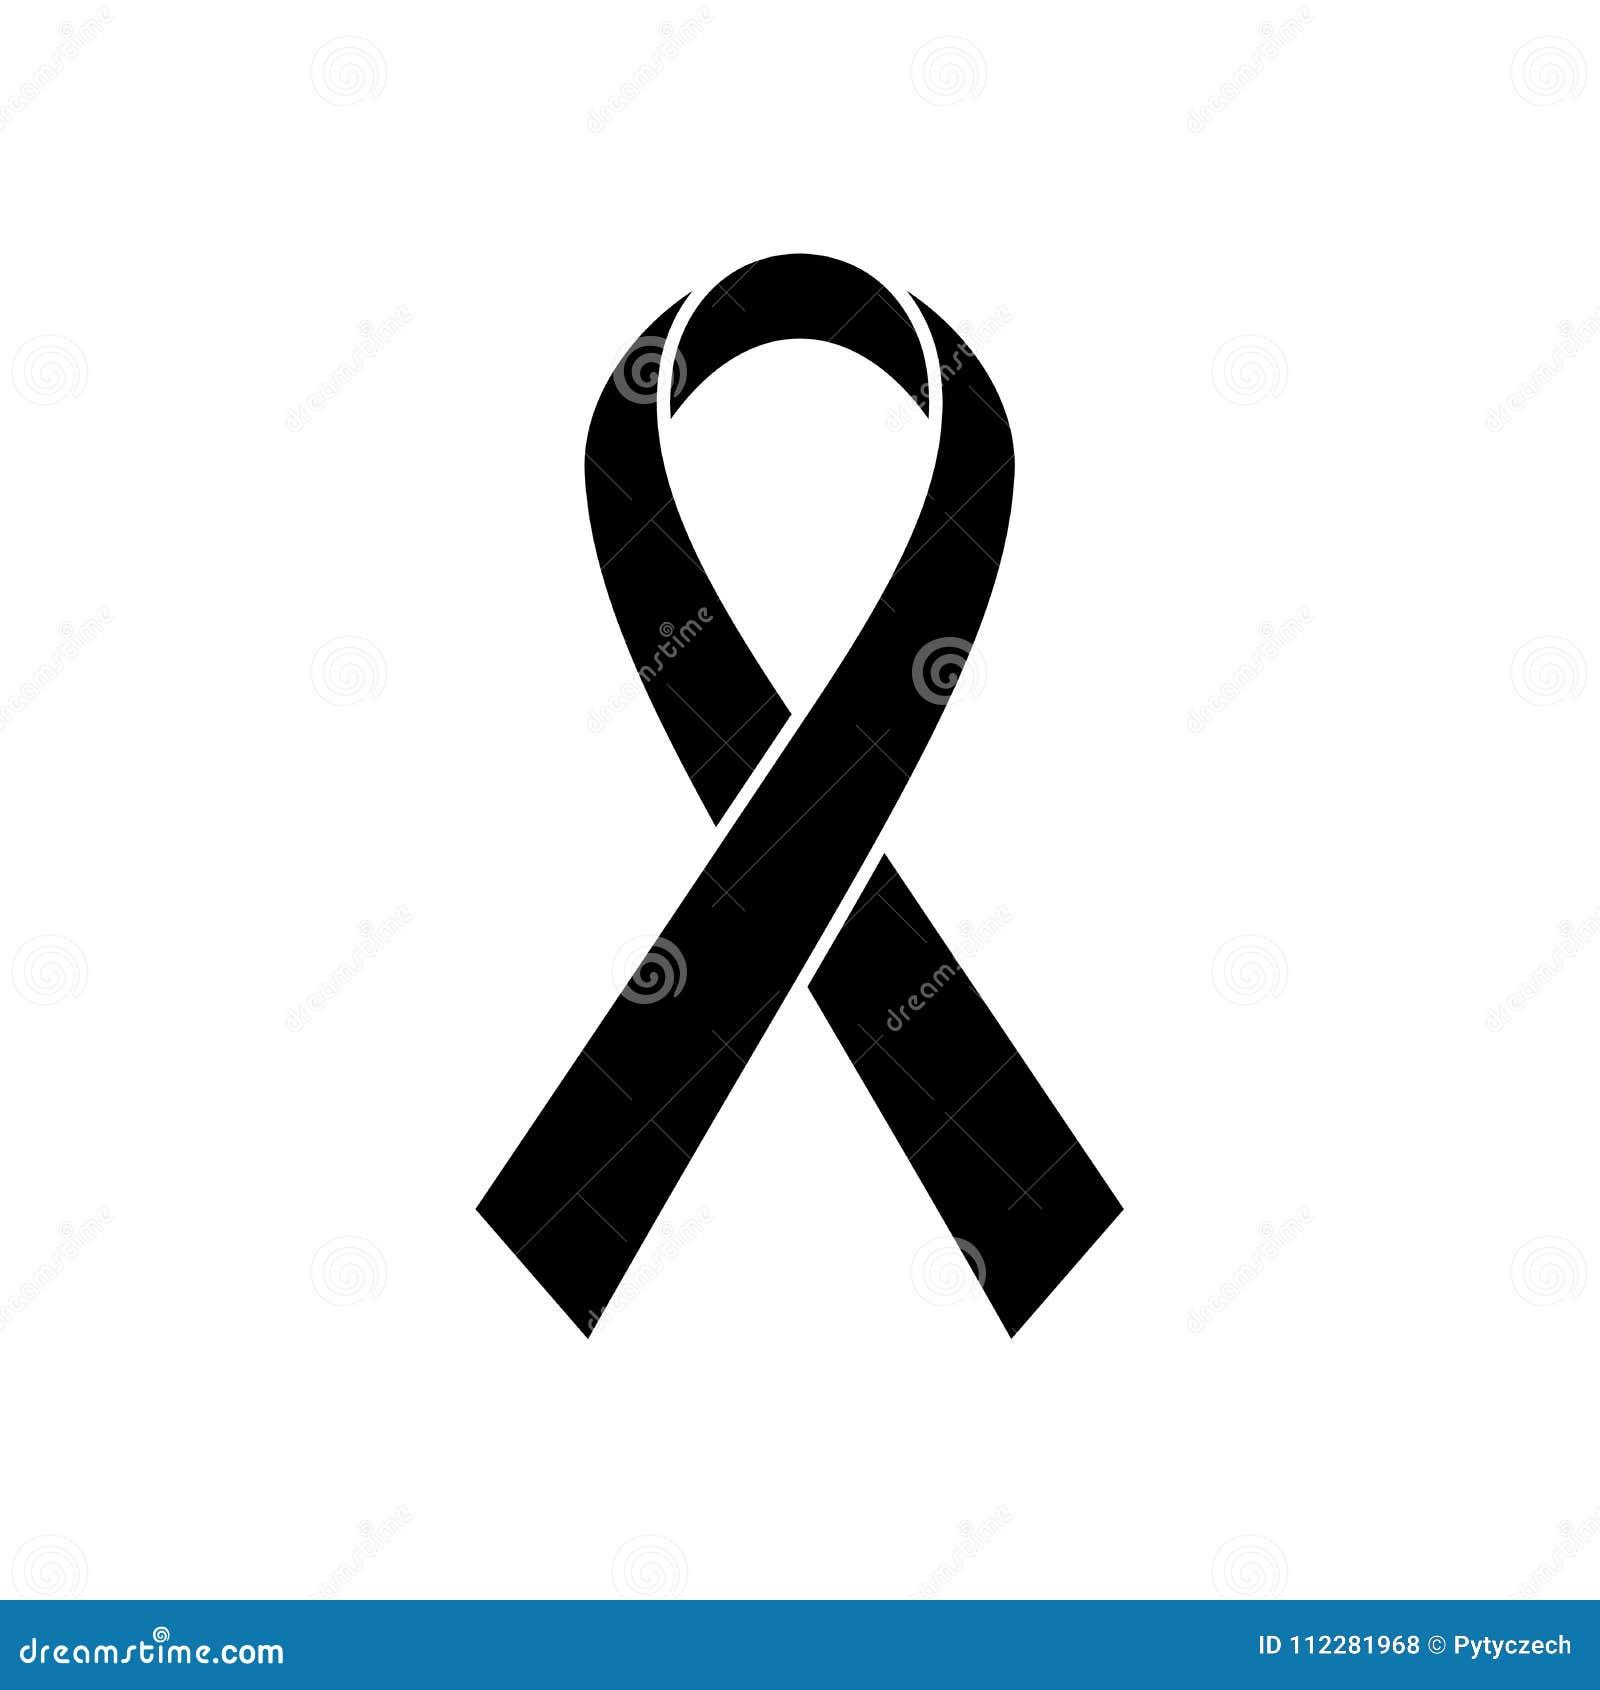 Breast Cancer Awareness Ribbon icon. Symbol of women healthcare. Simple black vector illustration